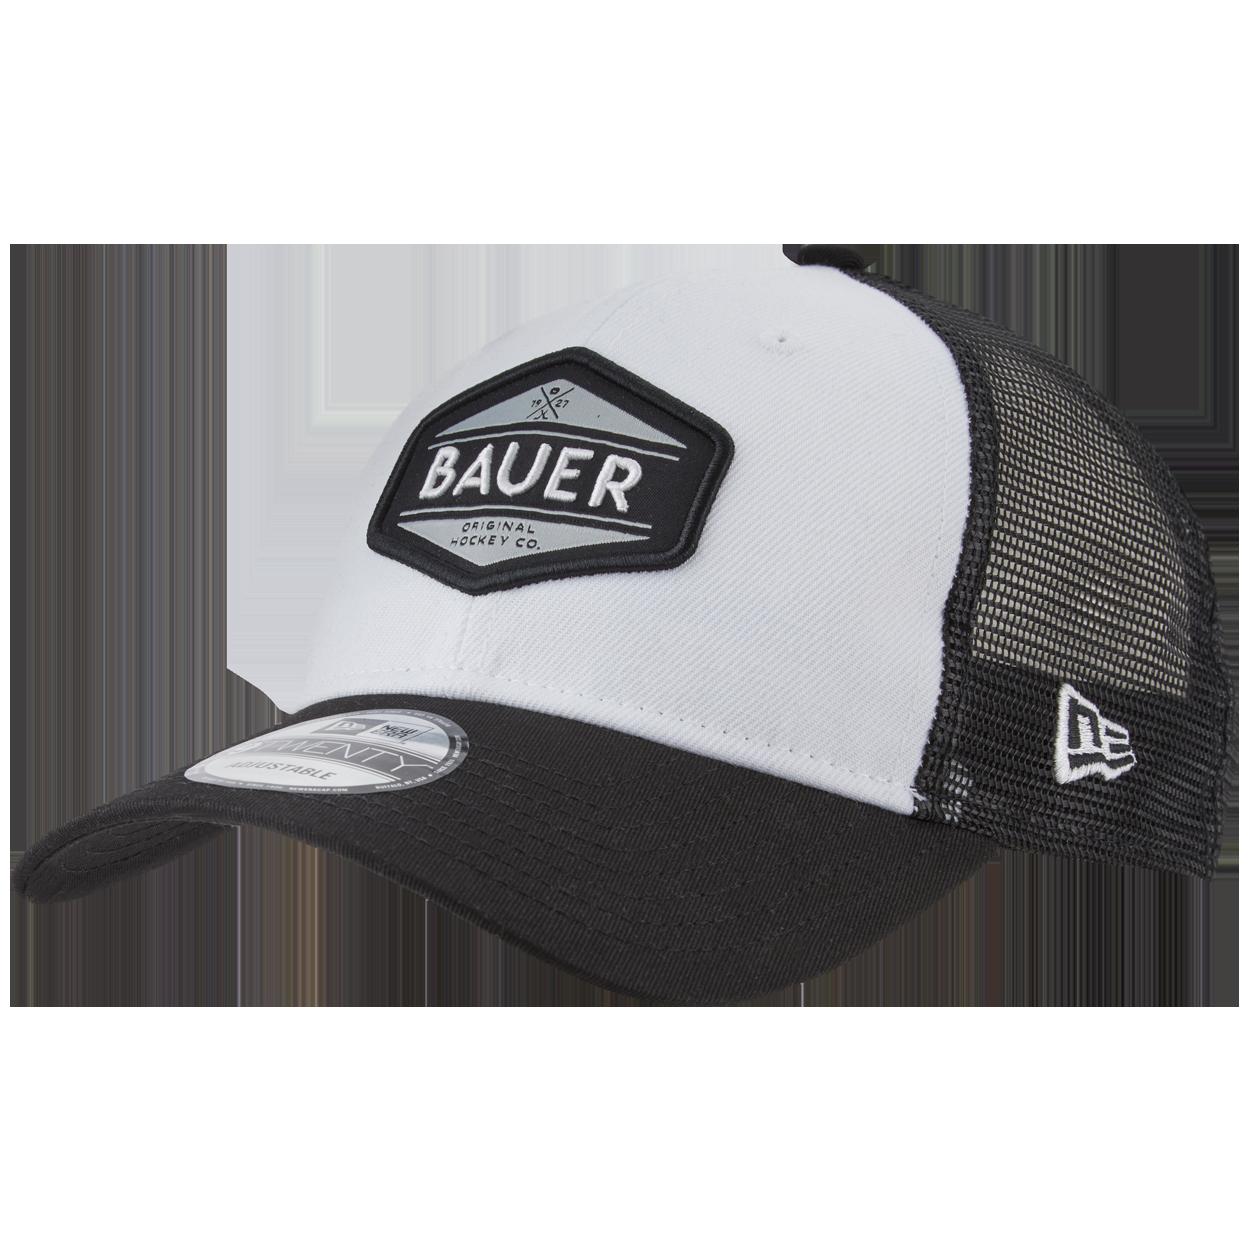 New Era 9TWENTY Adjustable Patch Hat